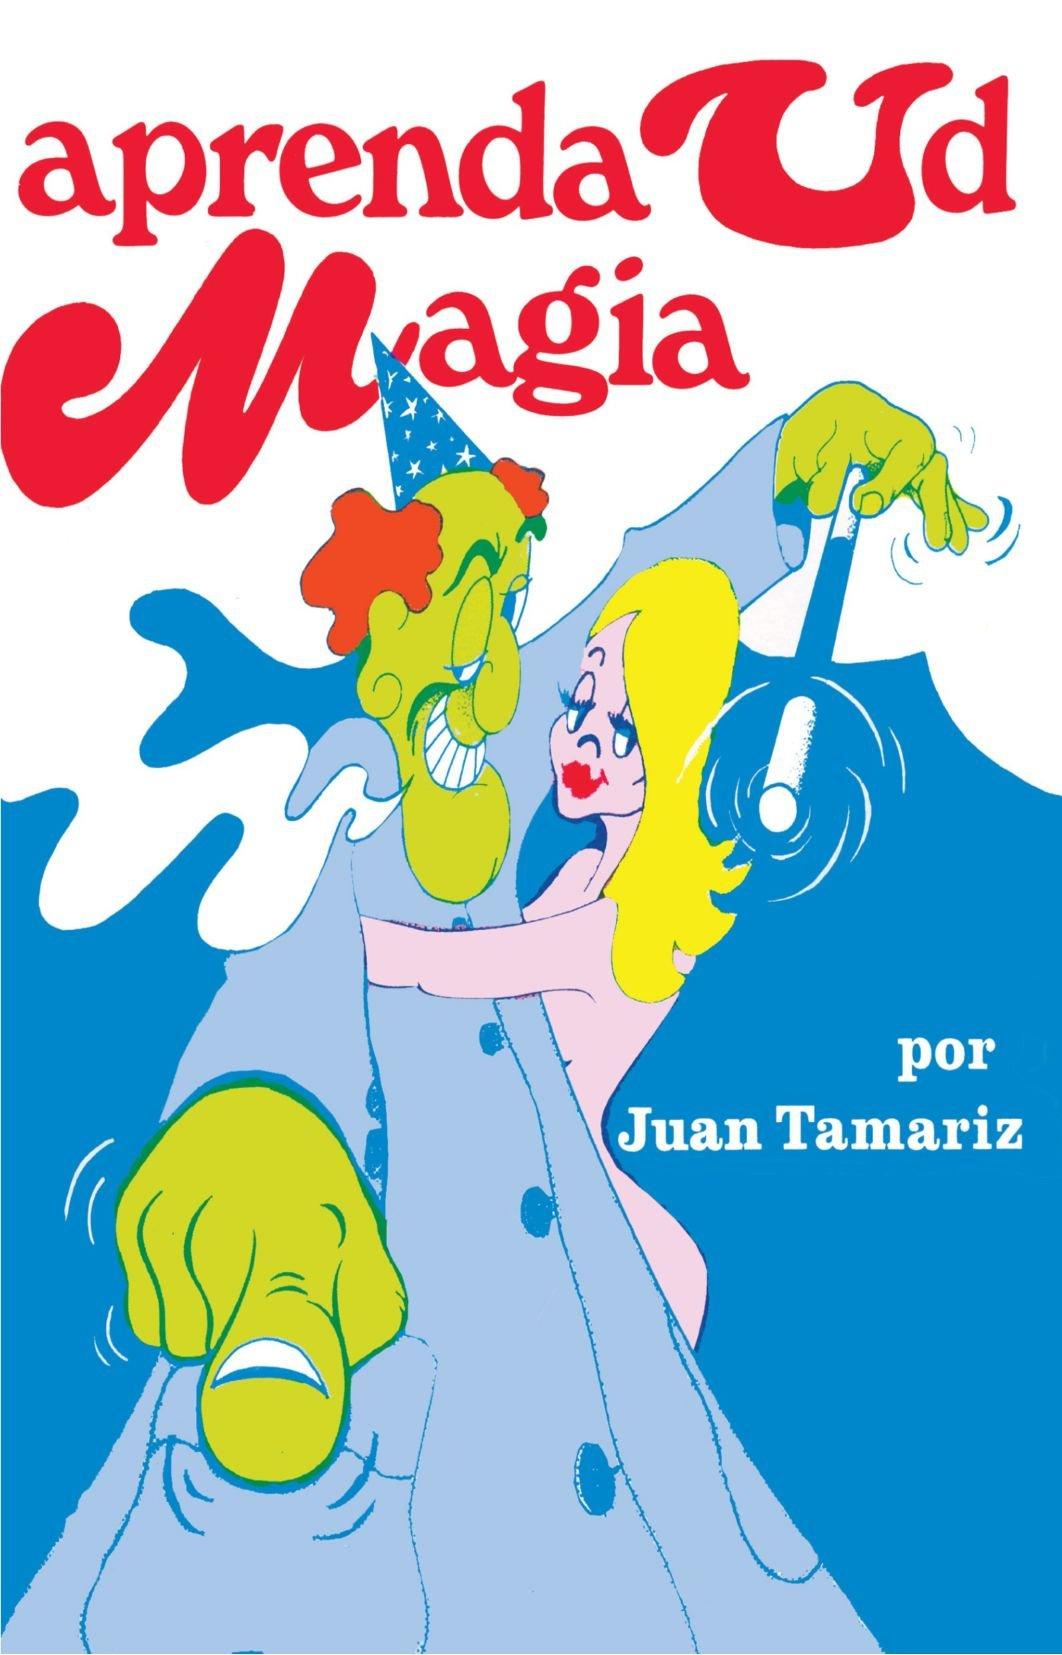 Aprenda ud magia (Spanish Edition): Juan Tamariz ...